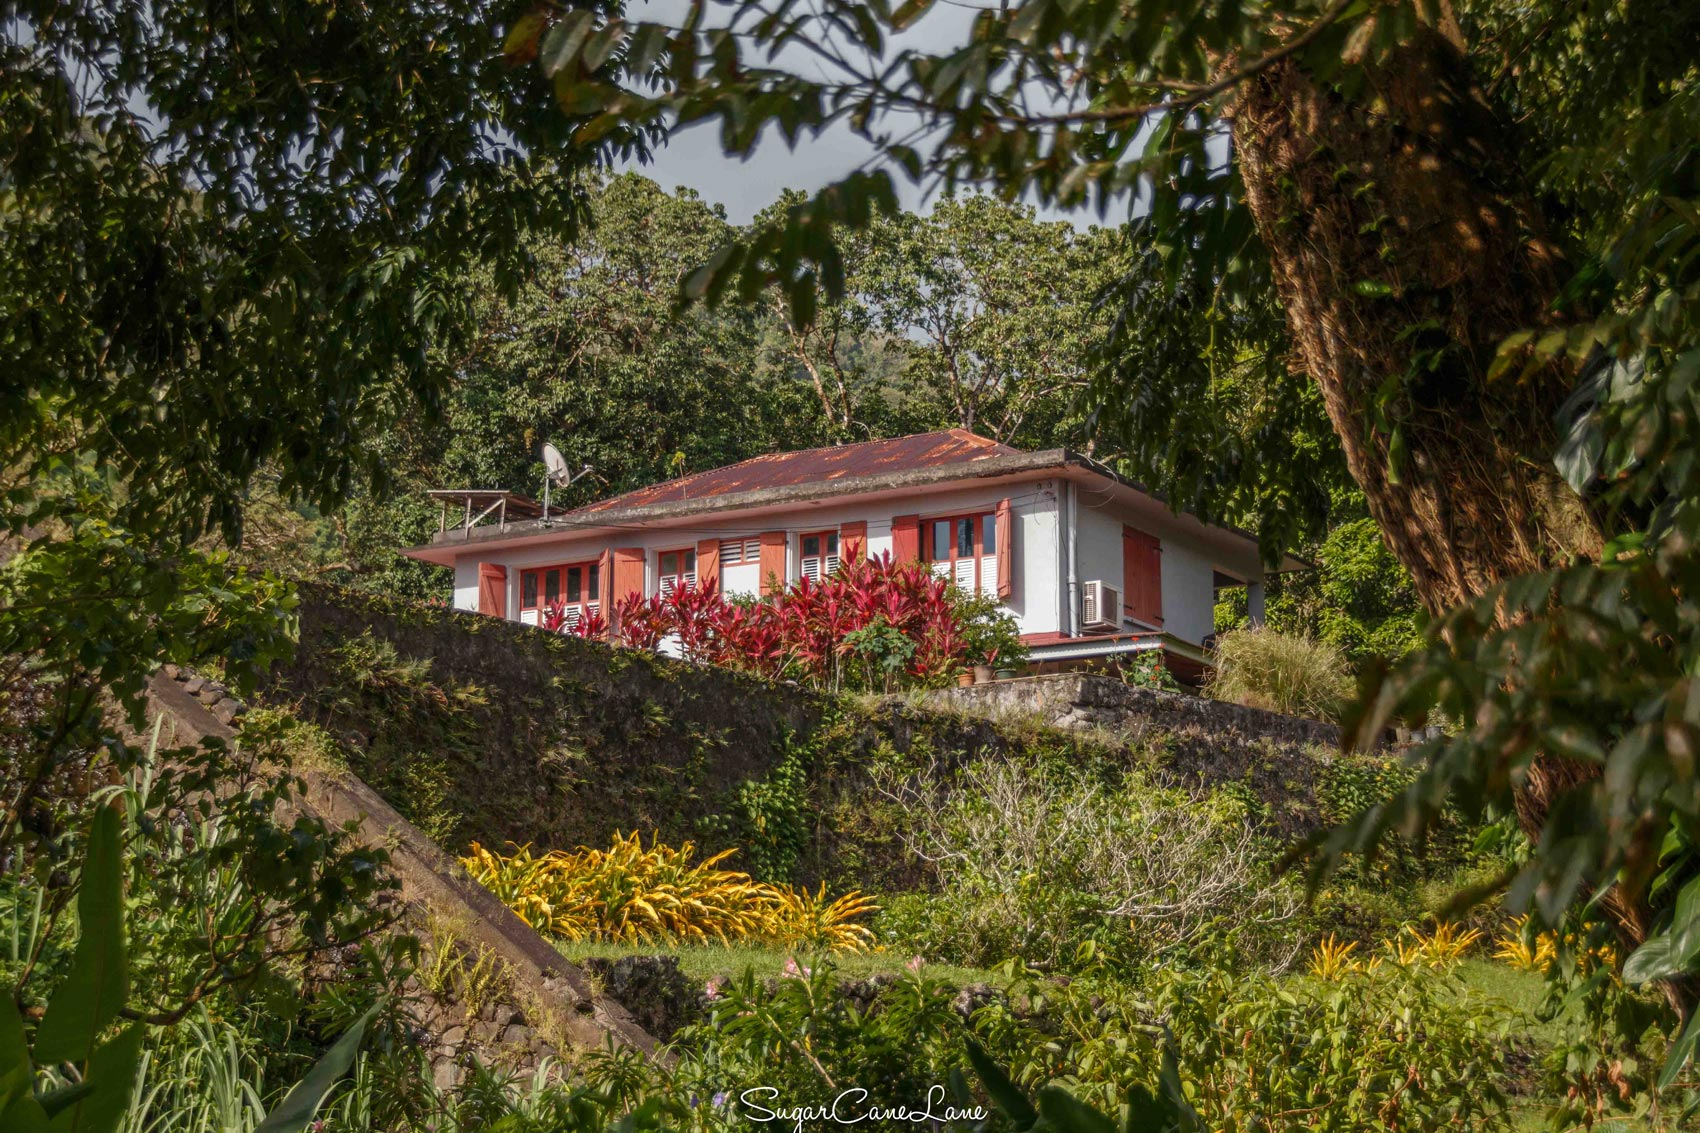 martinique_habitation-ceron_colonial-house_2901.jpg